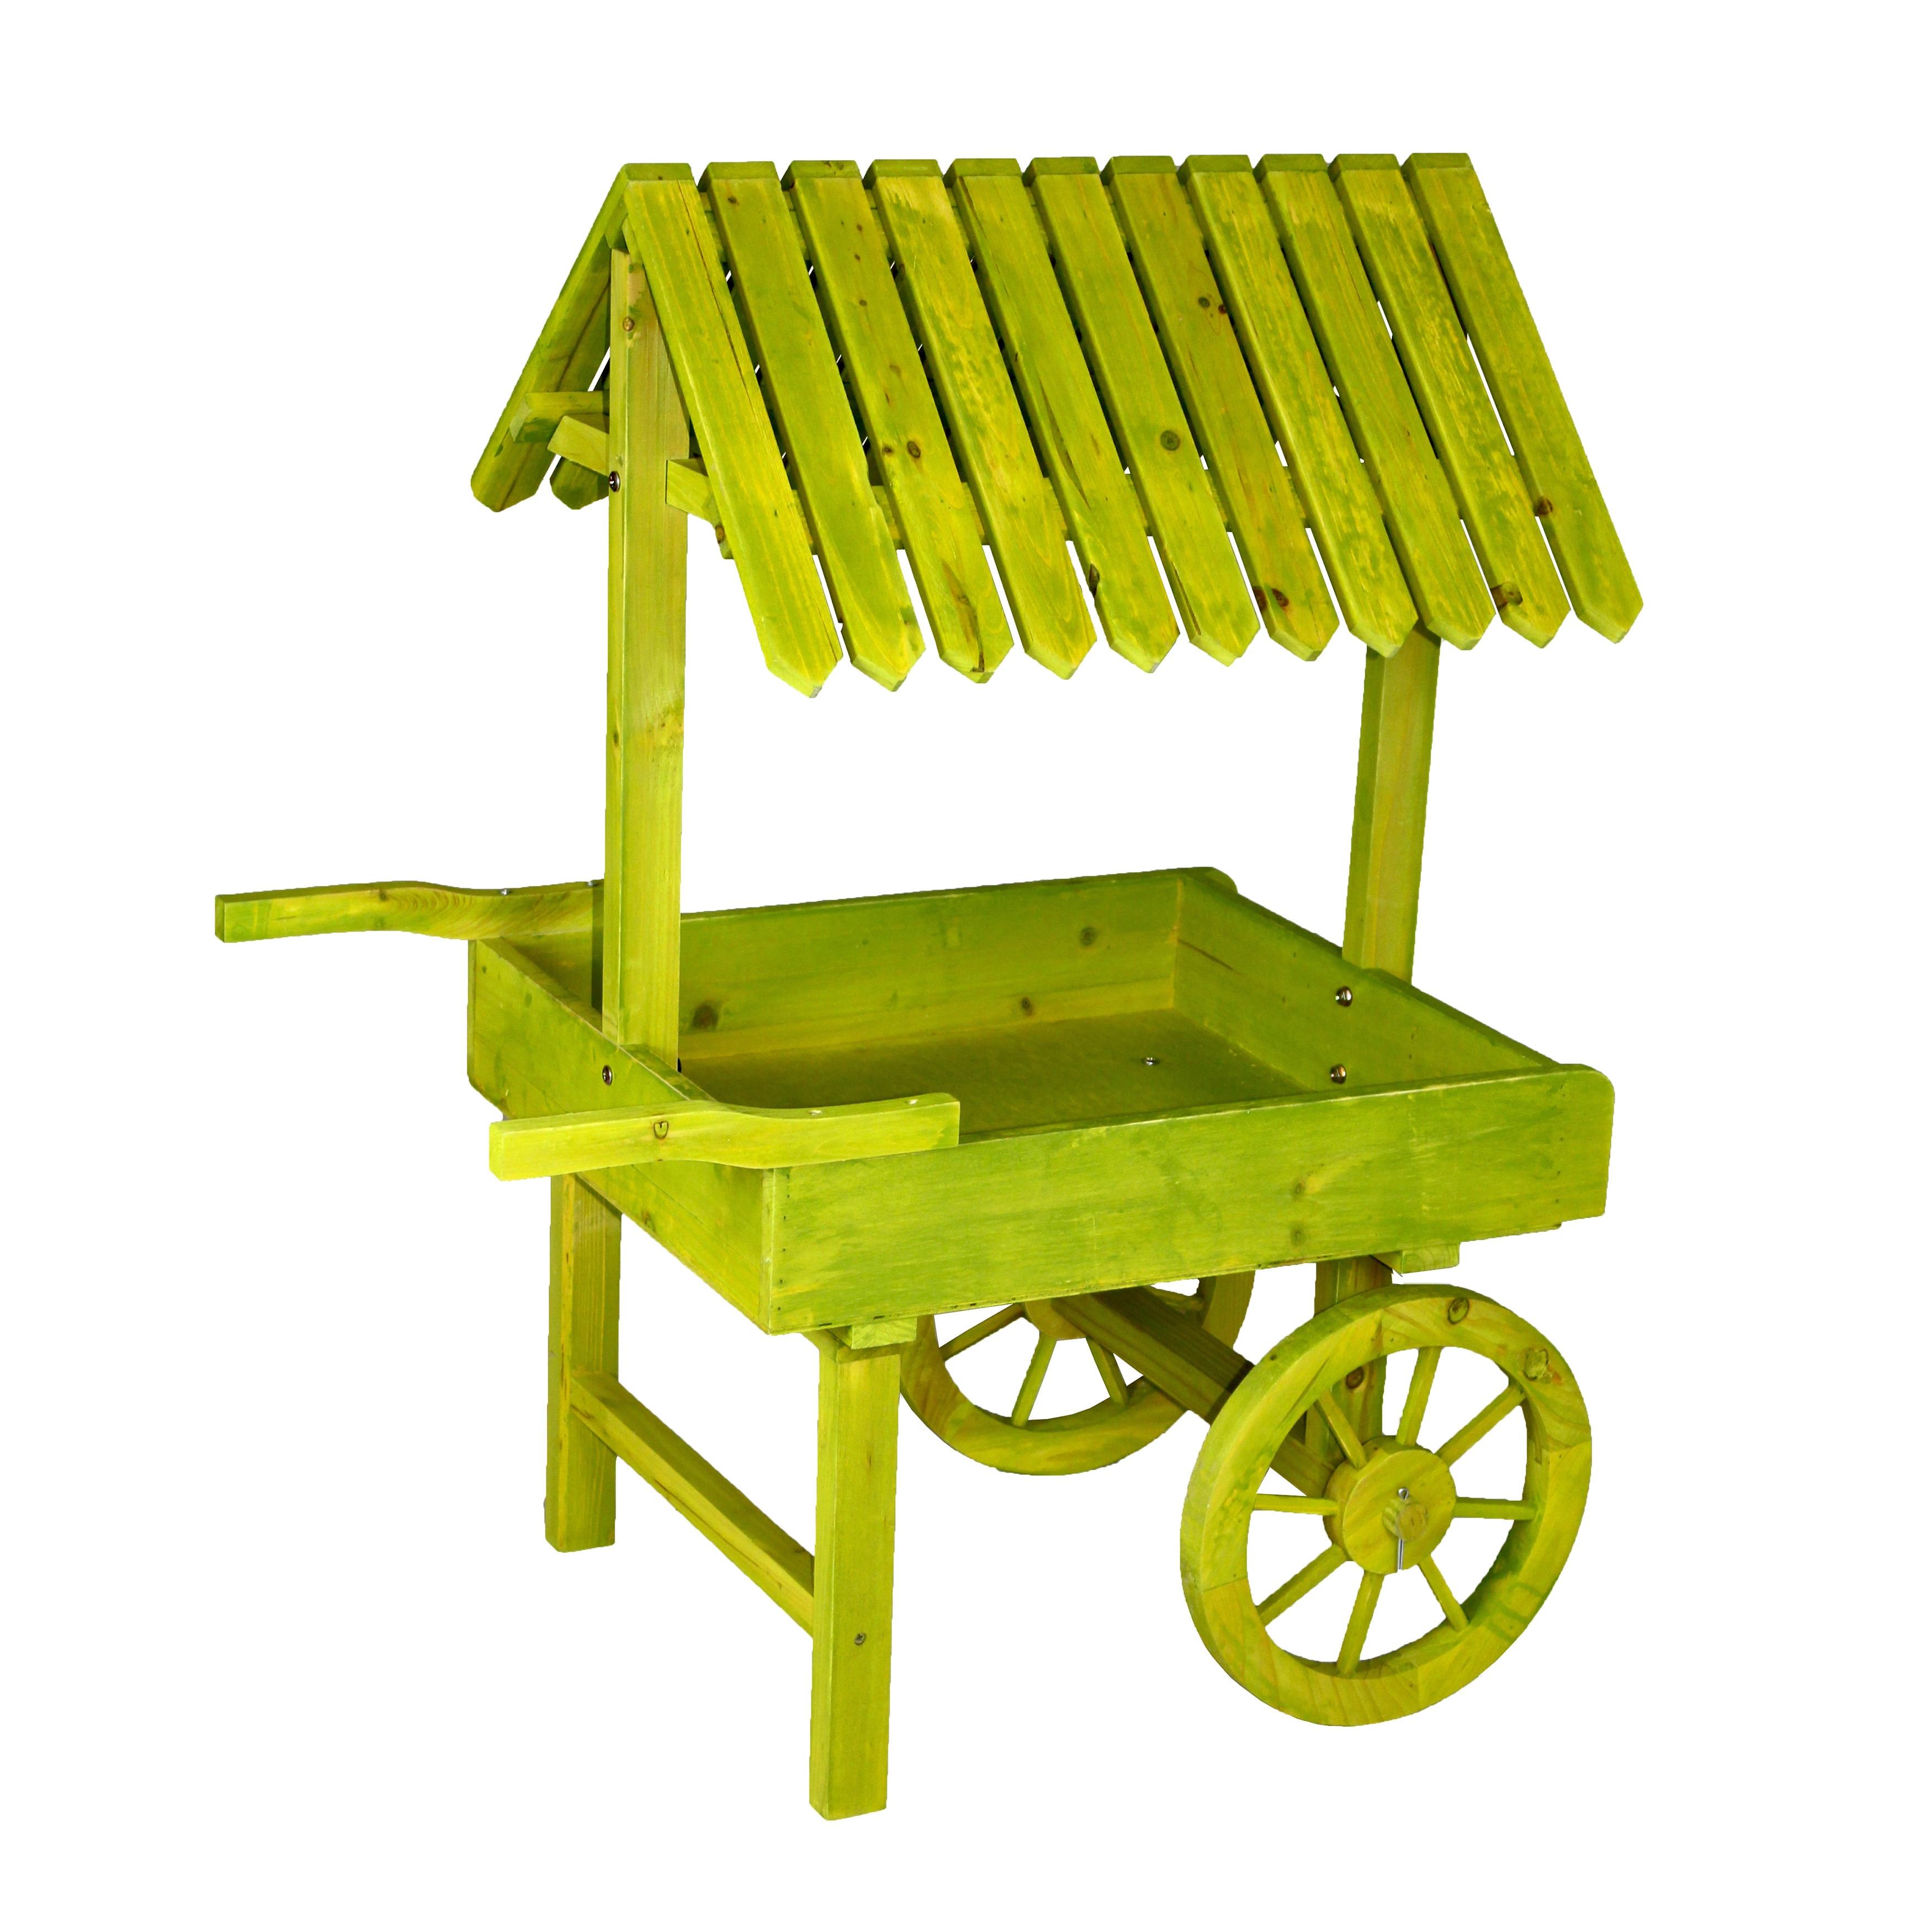 Antique Green Wooden Vendor Cart Planter - Free Shipping Today -  Overstock.com - 17201305